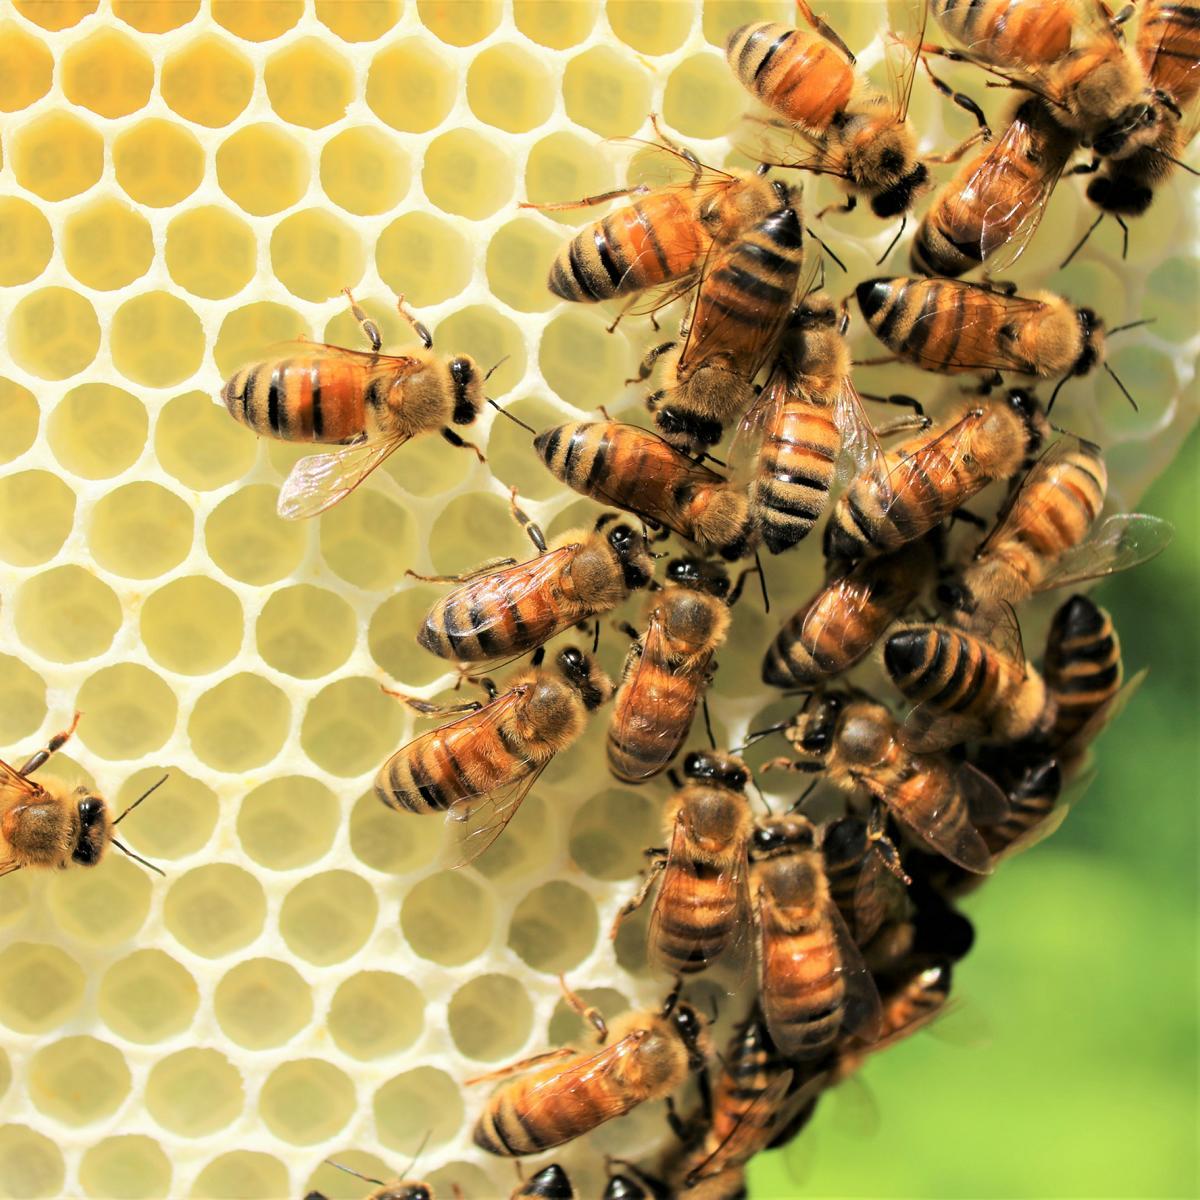 Style Hannover Die Bienenhuette 1 1 - Die Bienenhütte - Wesensgemäße Bienenhaltung